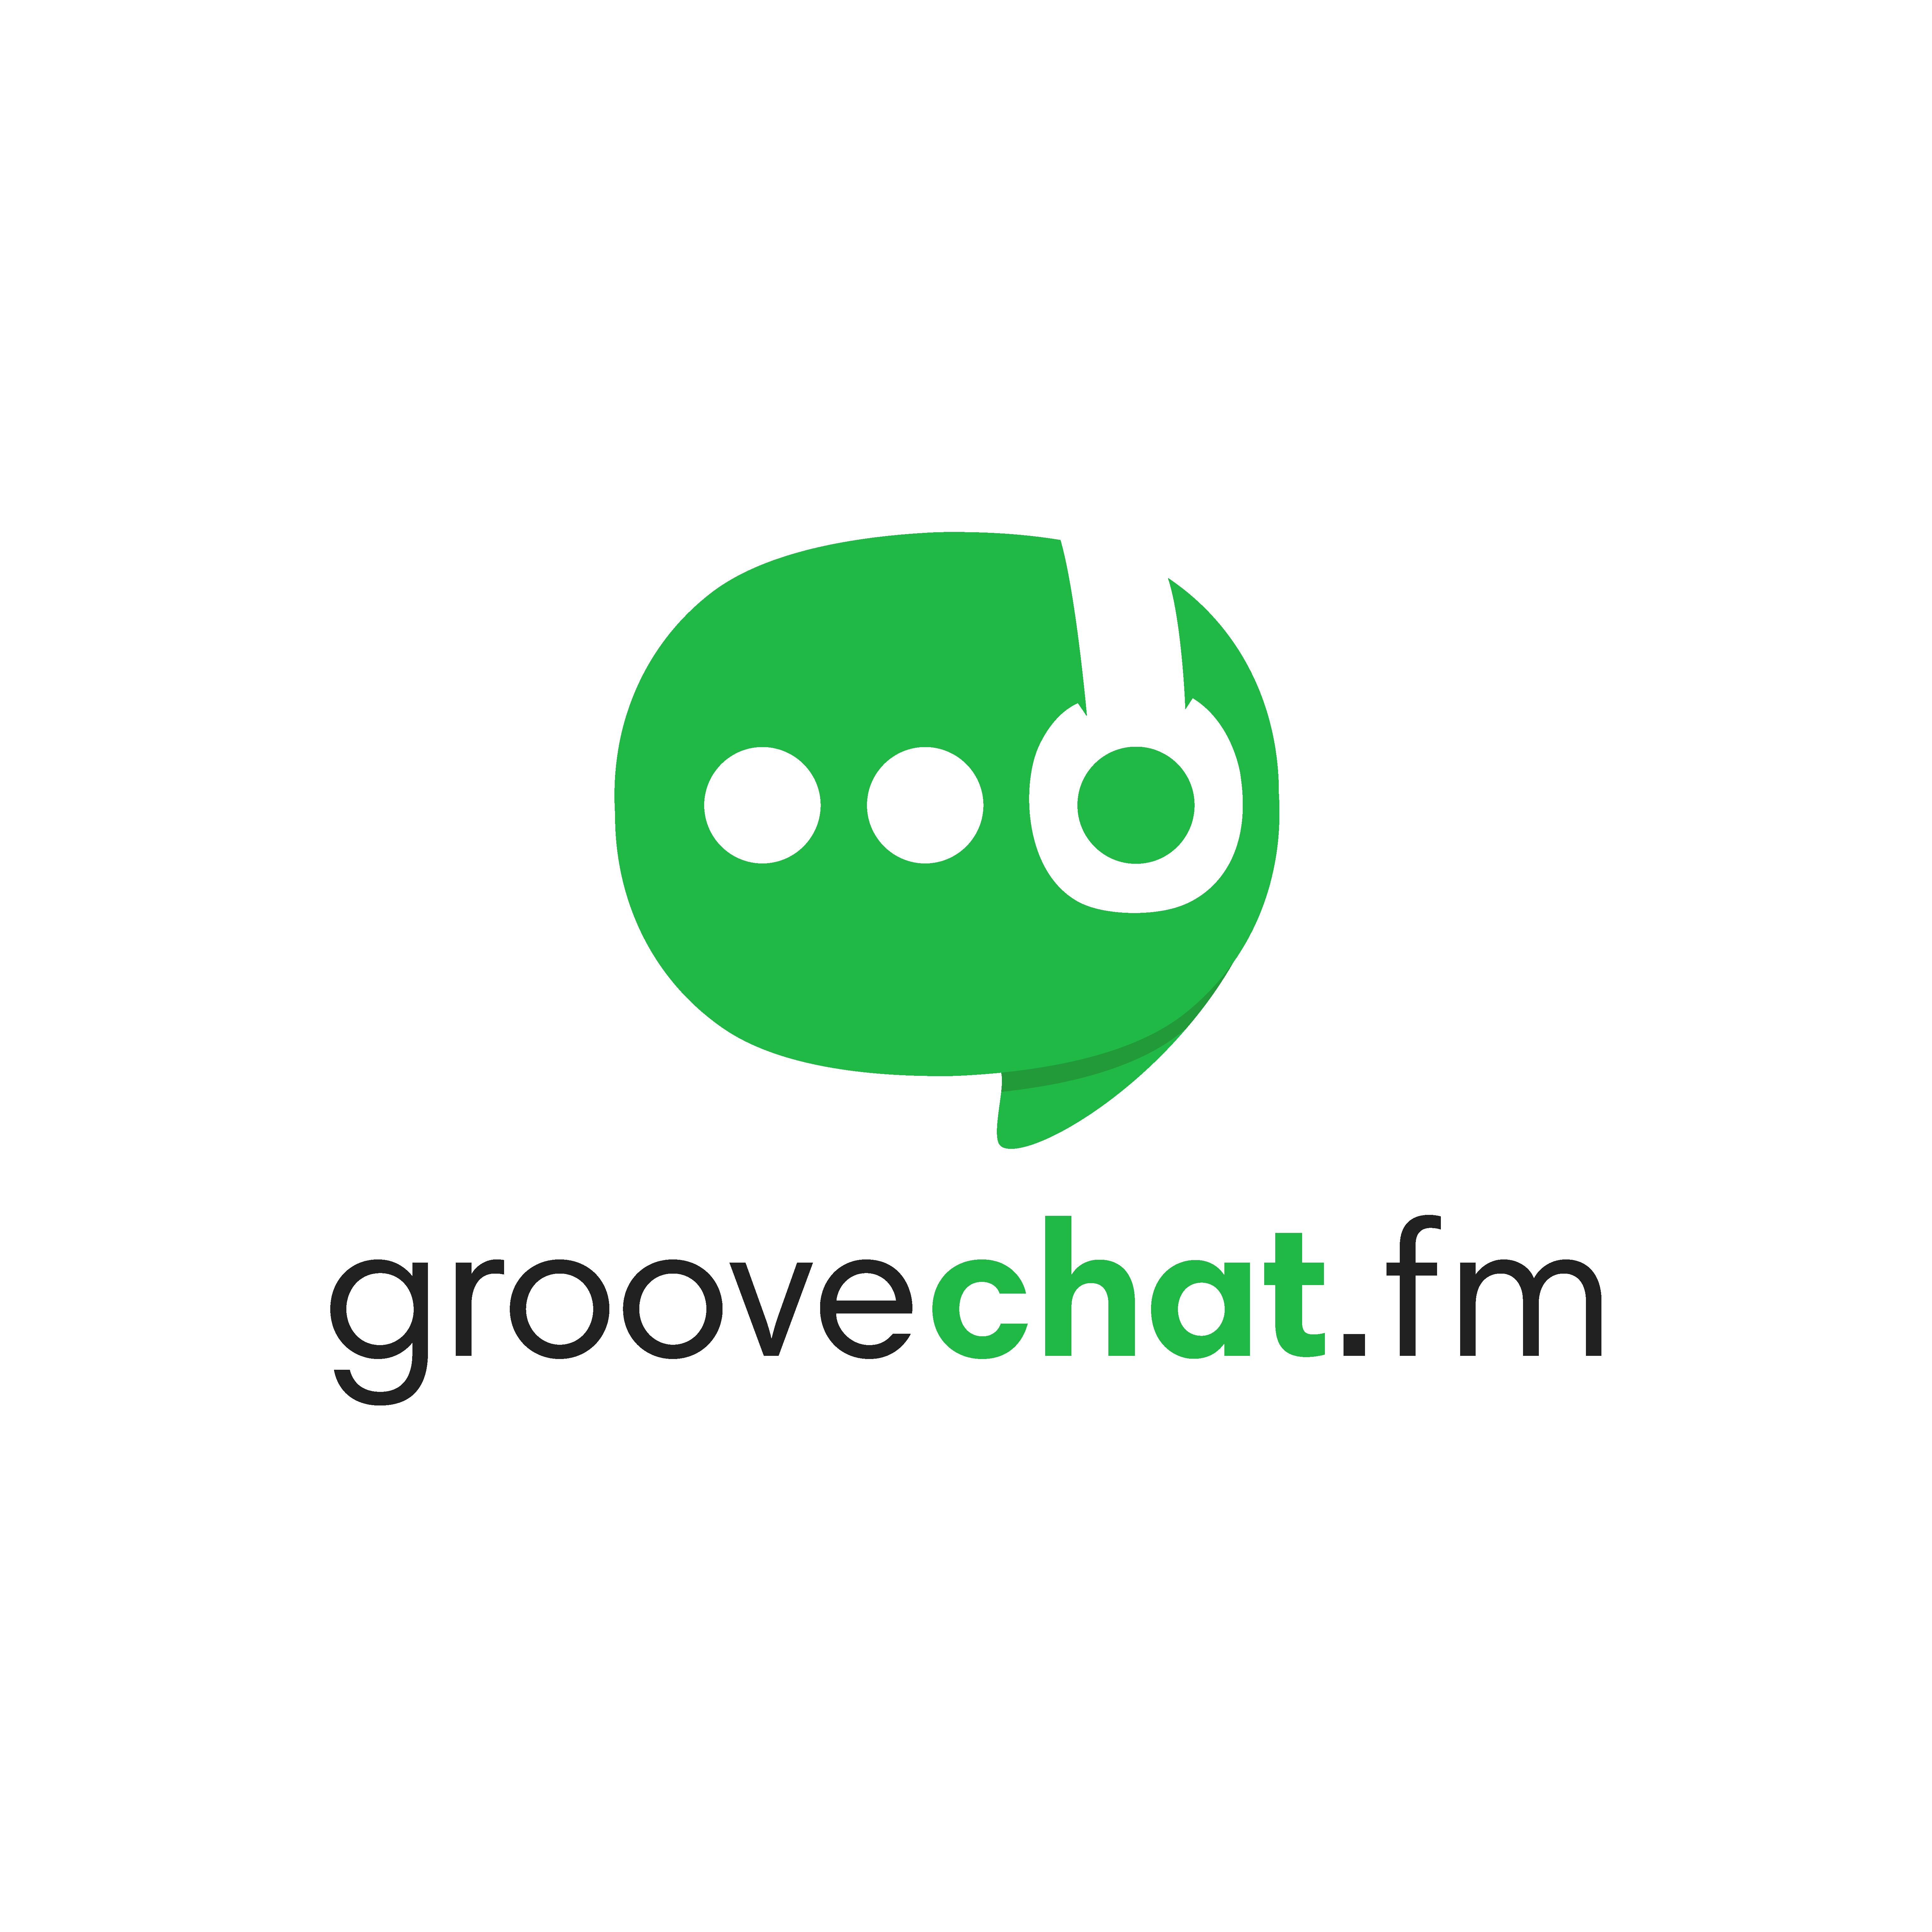 Design a logo and colour scheme for a collaborative-listening SPA web app